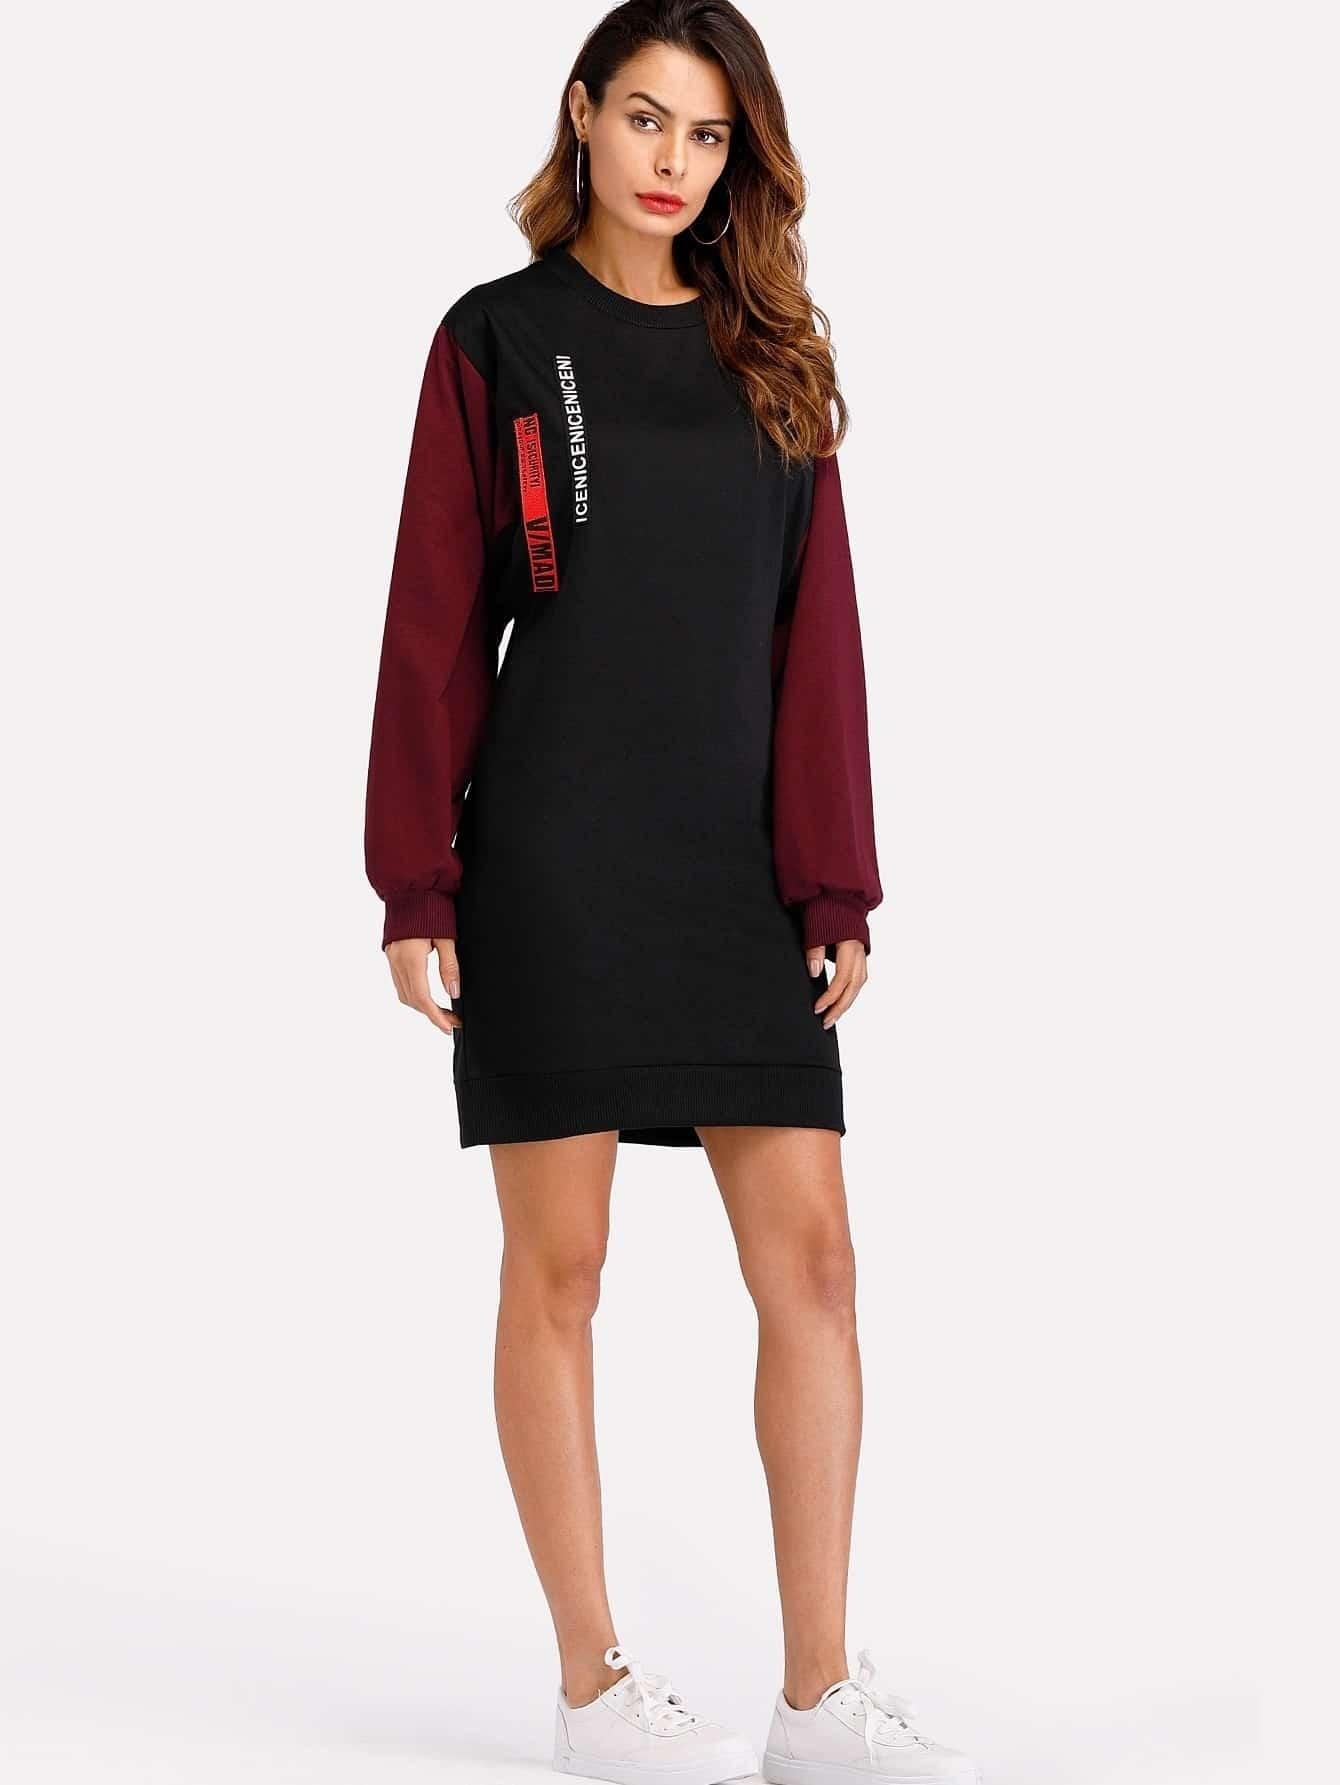 Contrast Sleeve Tape Detail Sweatshirt Dress frill sleeve tape detail sweatshirt